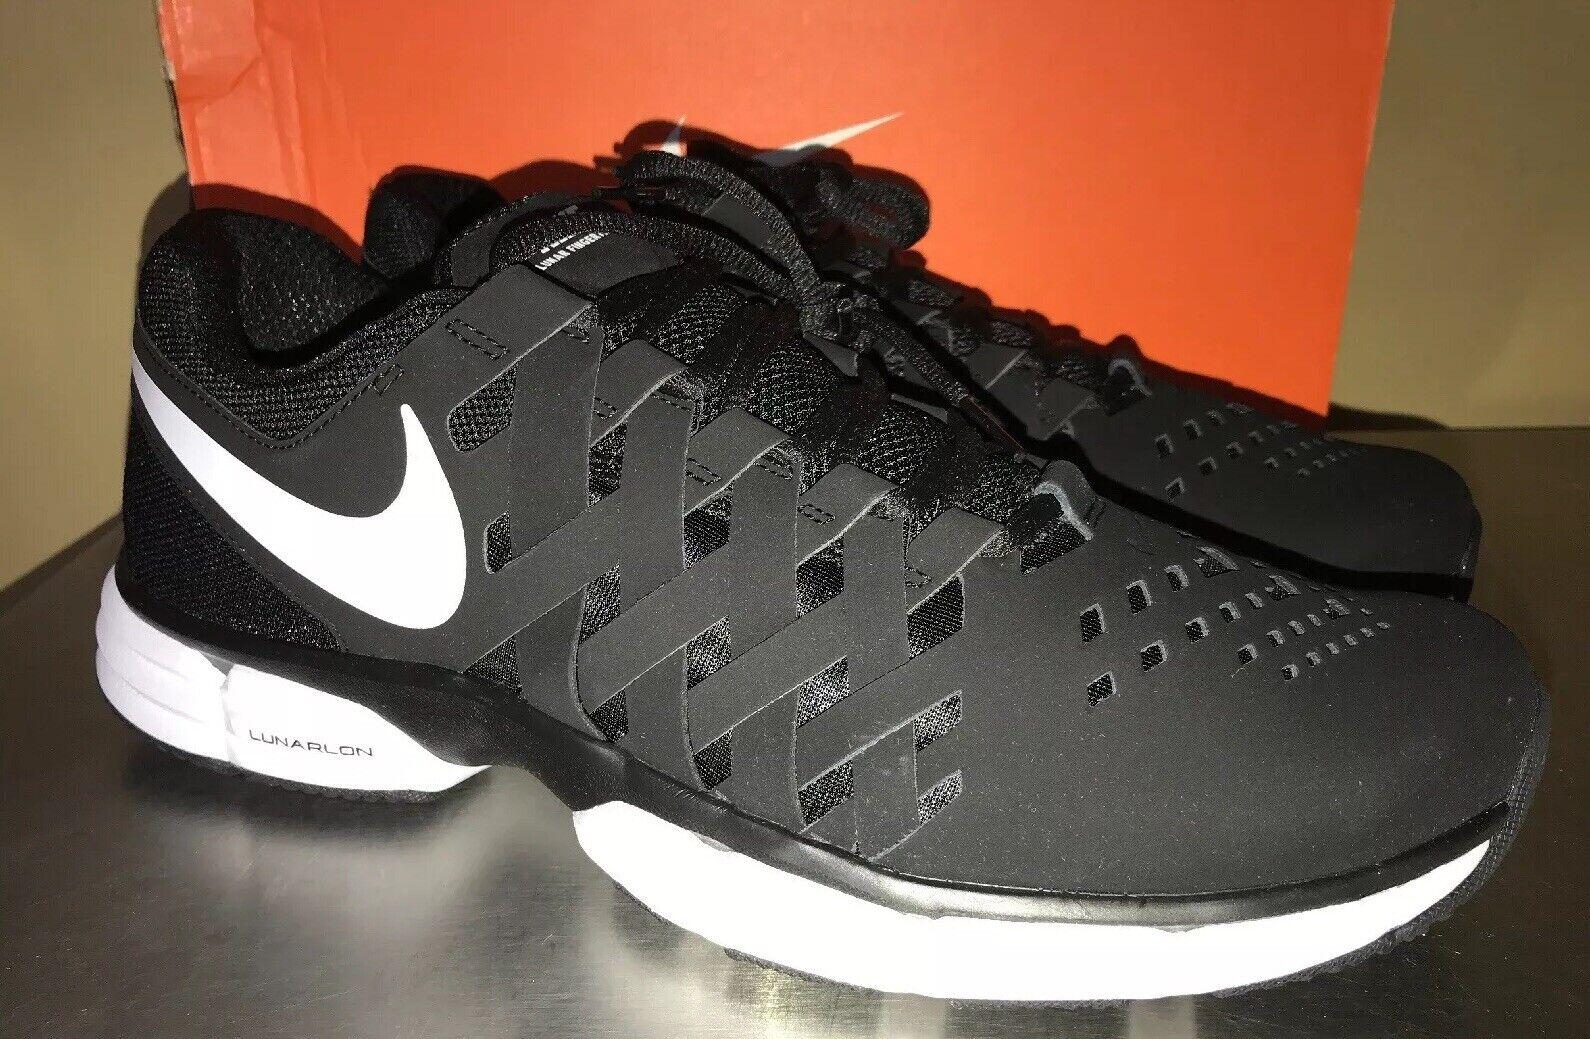 NIKE Lunar Fingertrap TR shoes 898065 001 Black white Men's Size 11 Training